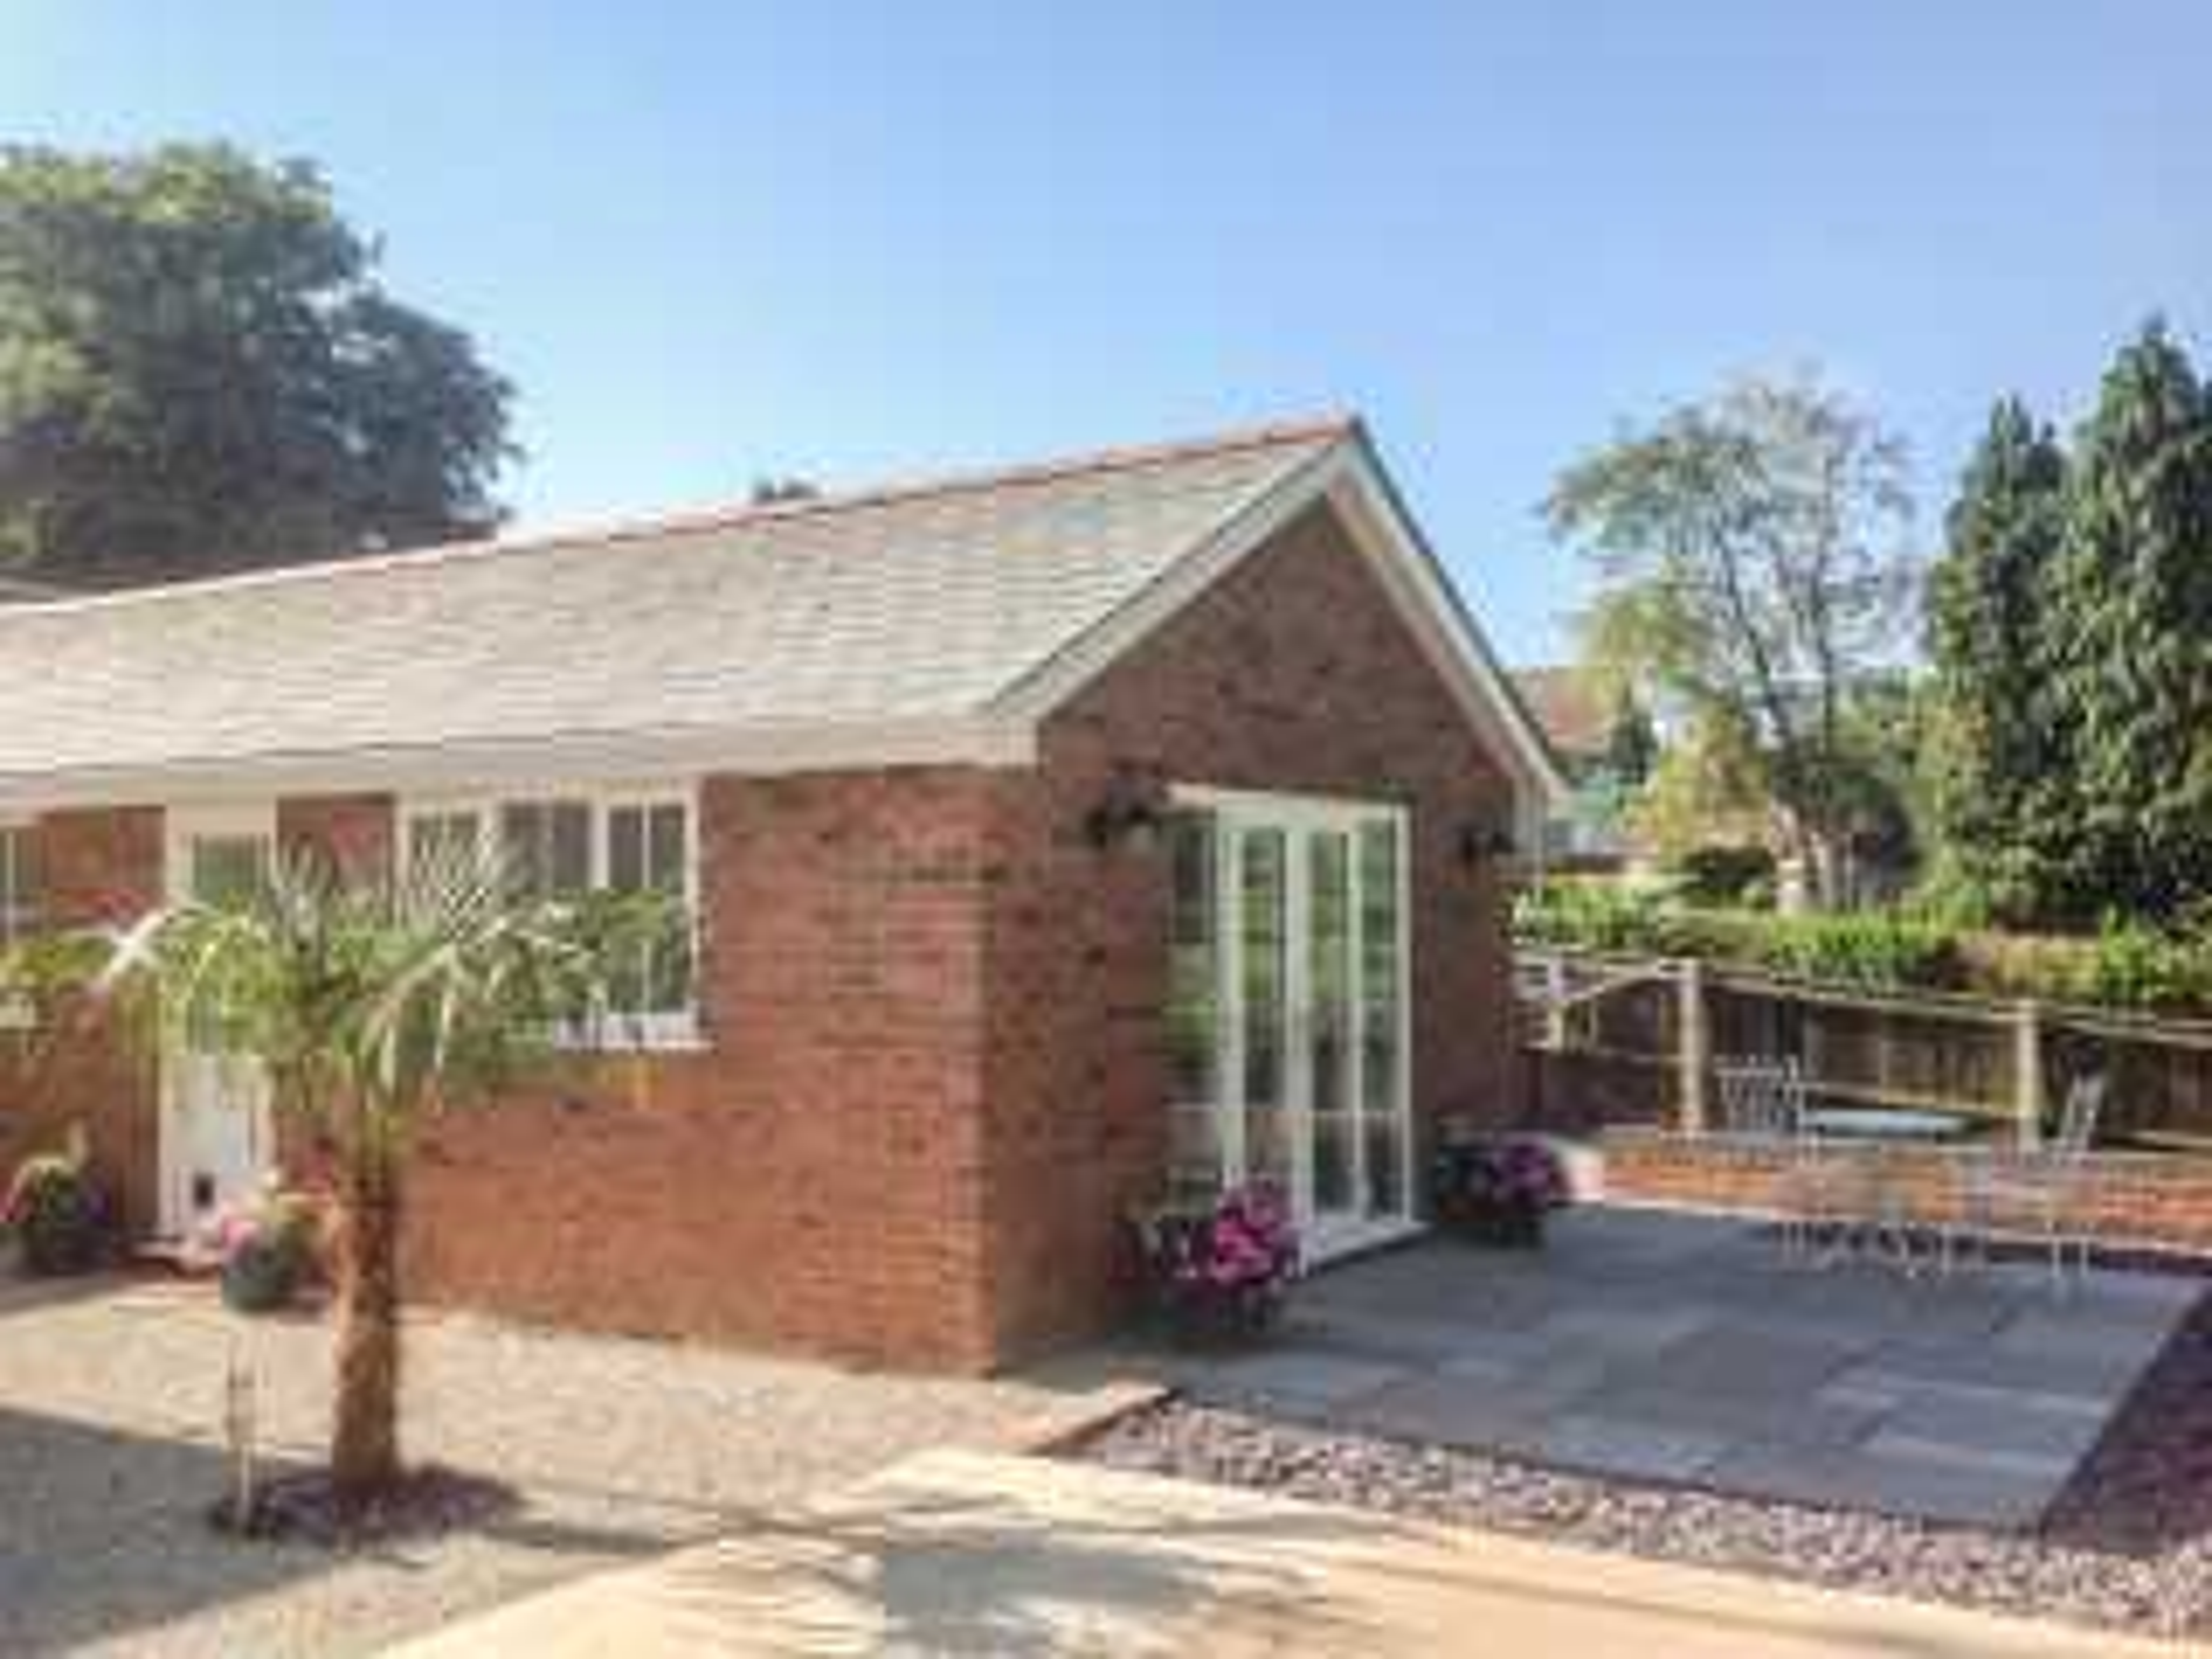 1 bedroom Cottage for rent in Verwood